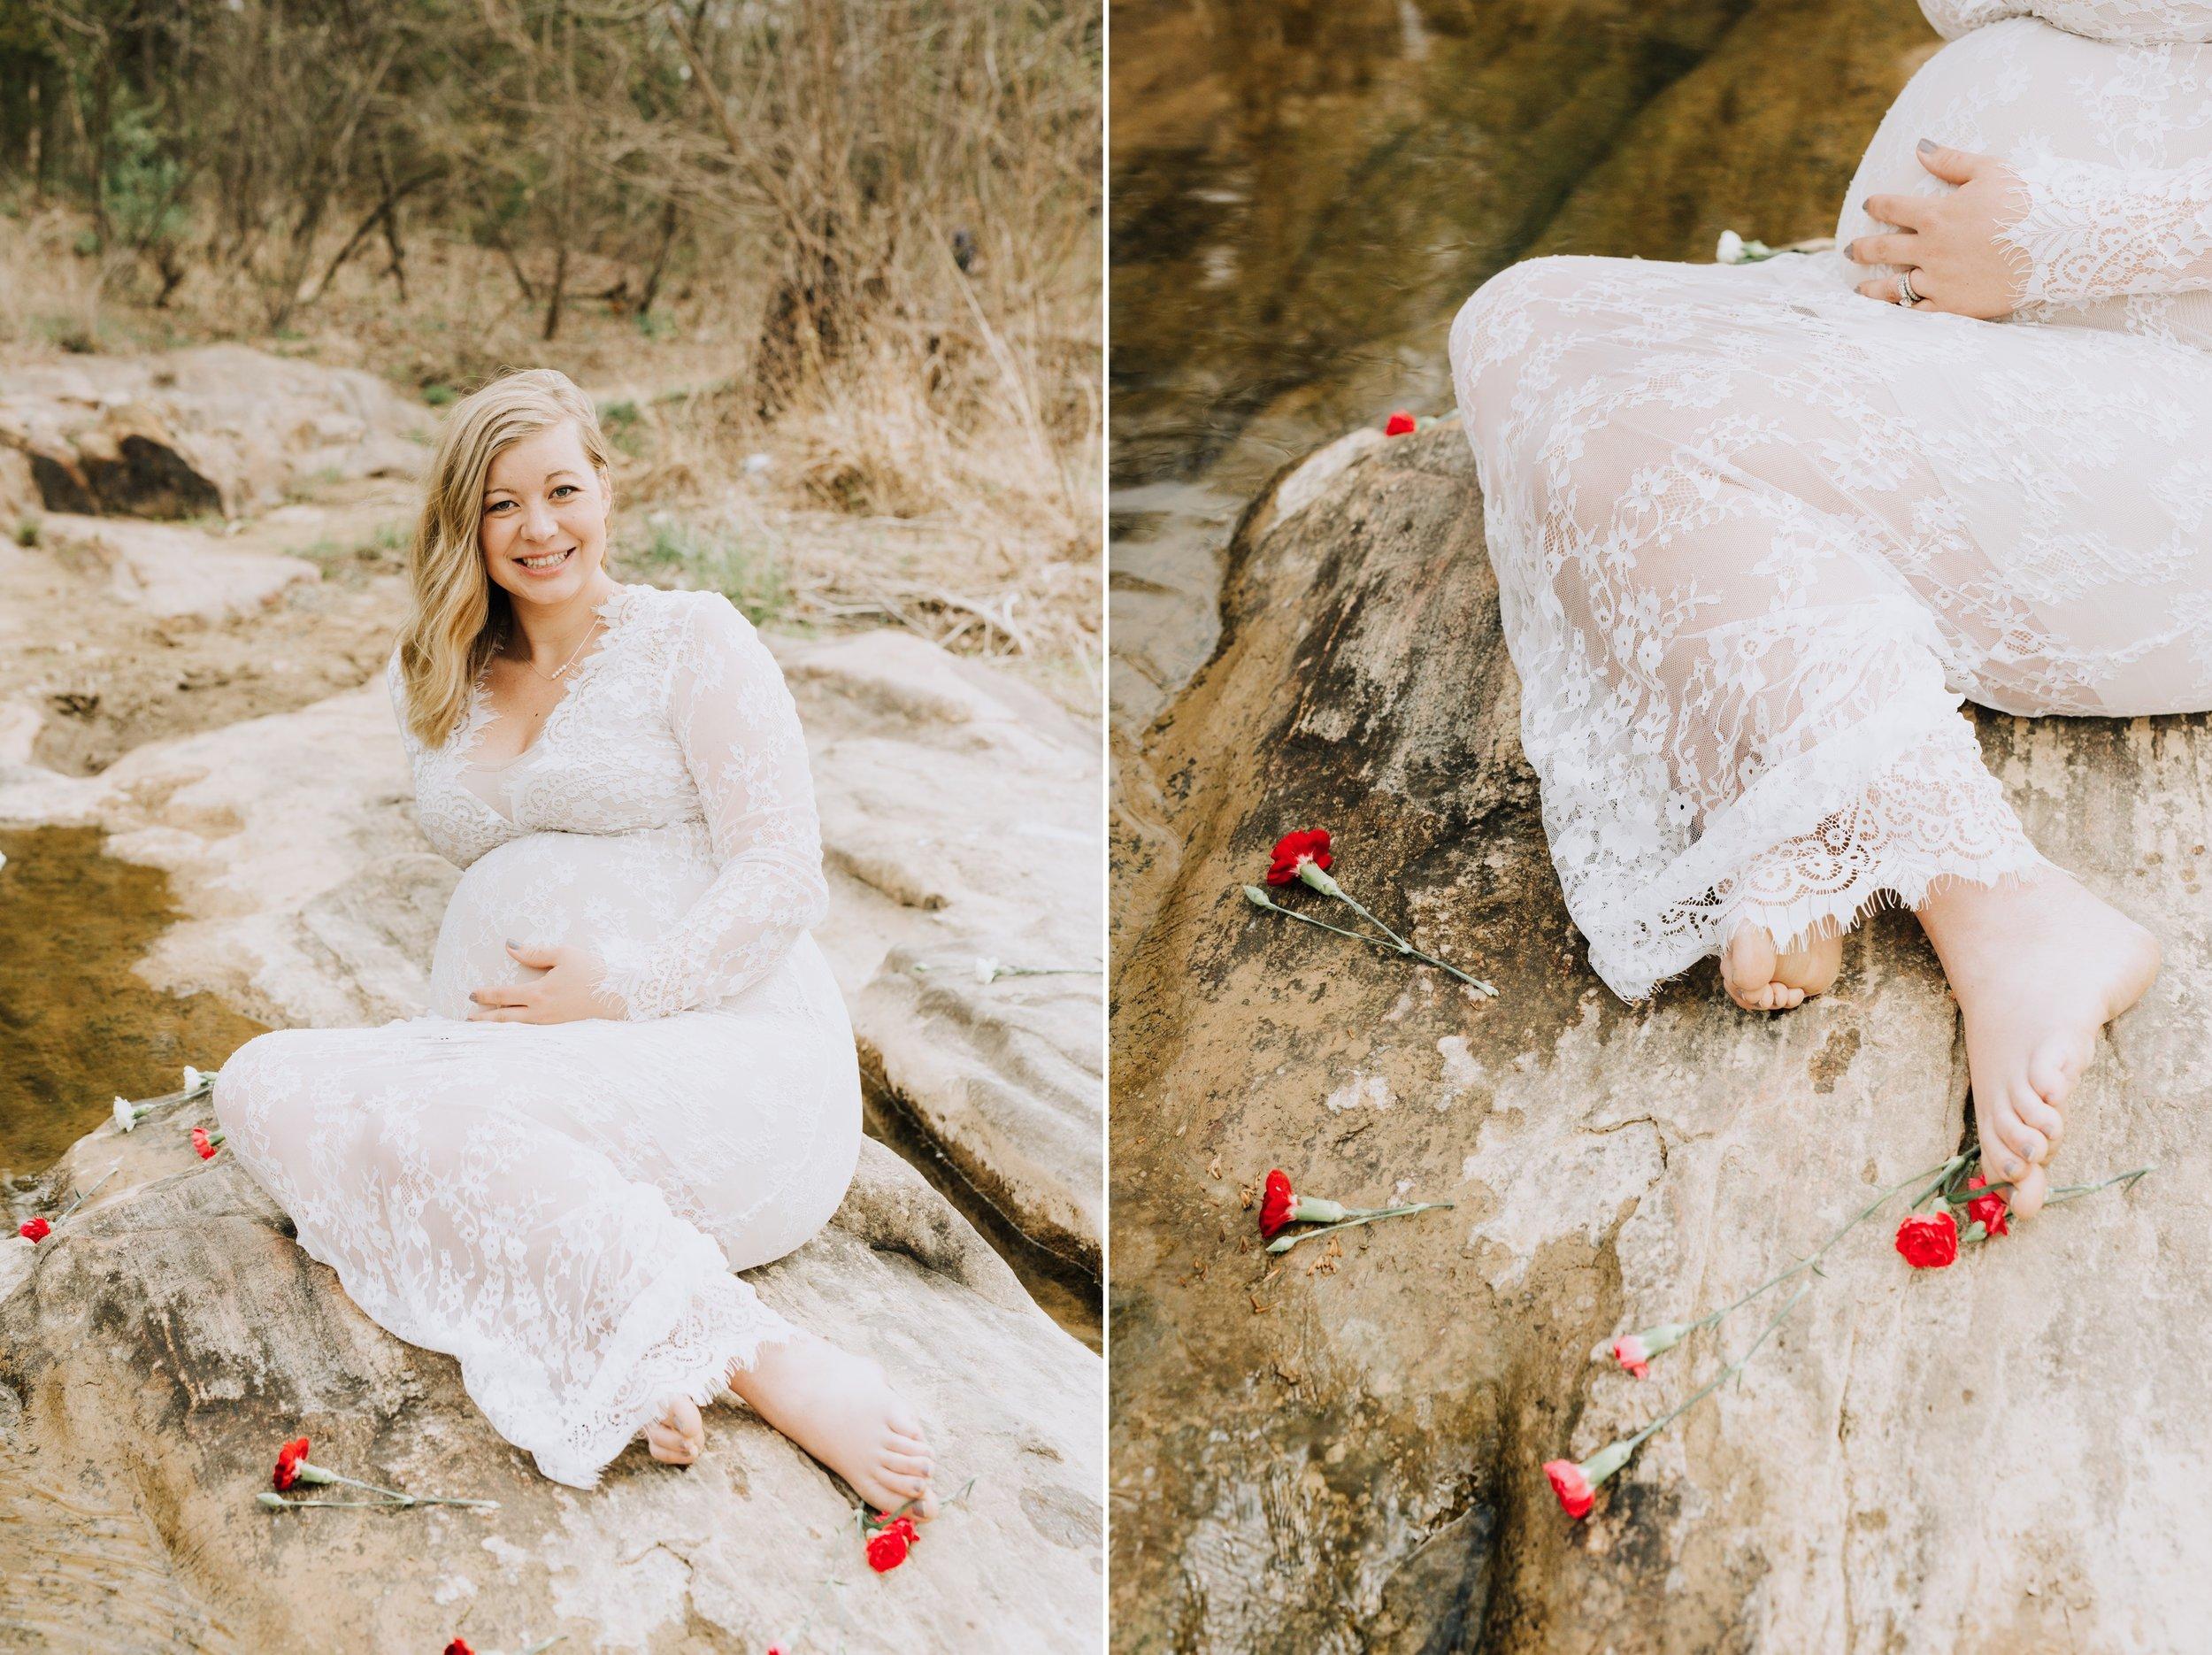 Fredericksburg_Virginia_Maternity_Photographer_Riverside (38)-horz.jpg